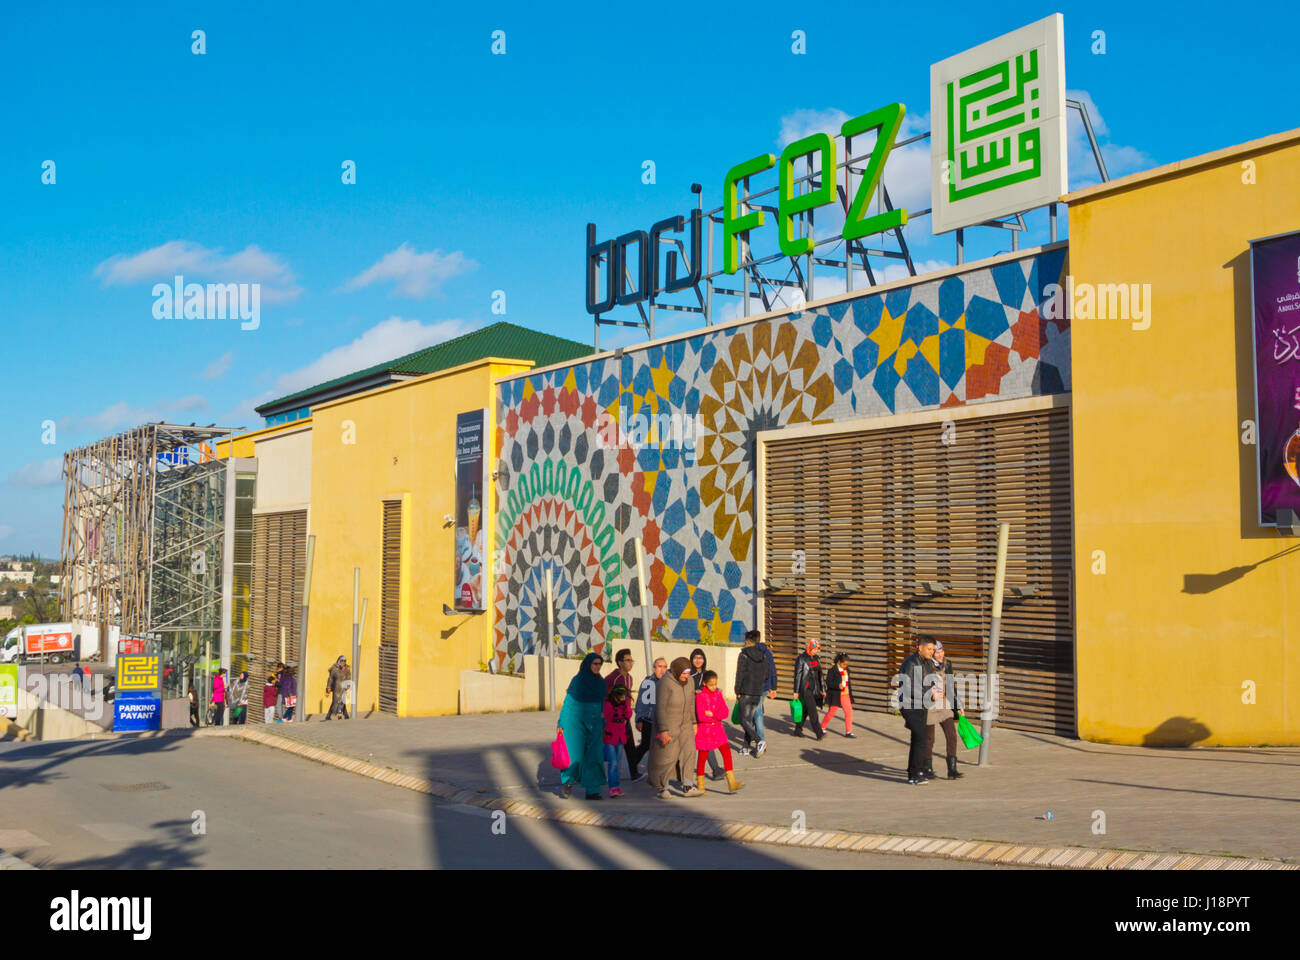 borj fez shopping centre ville nouvelle fez morocco africa J18PYT